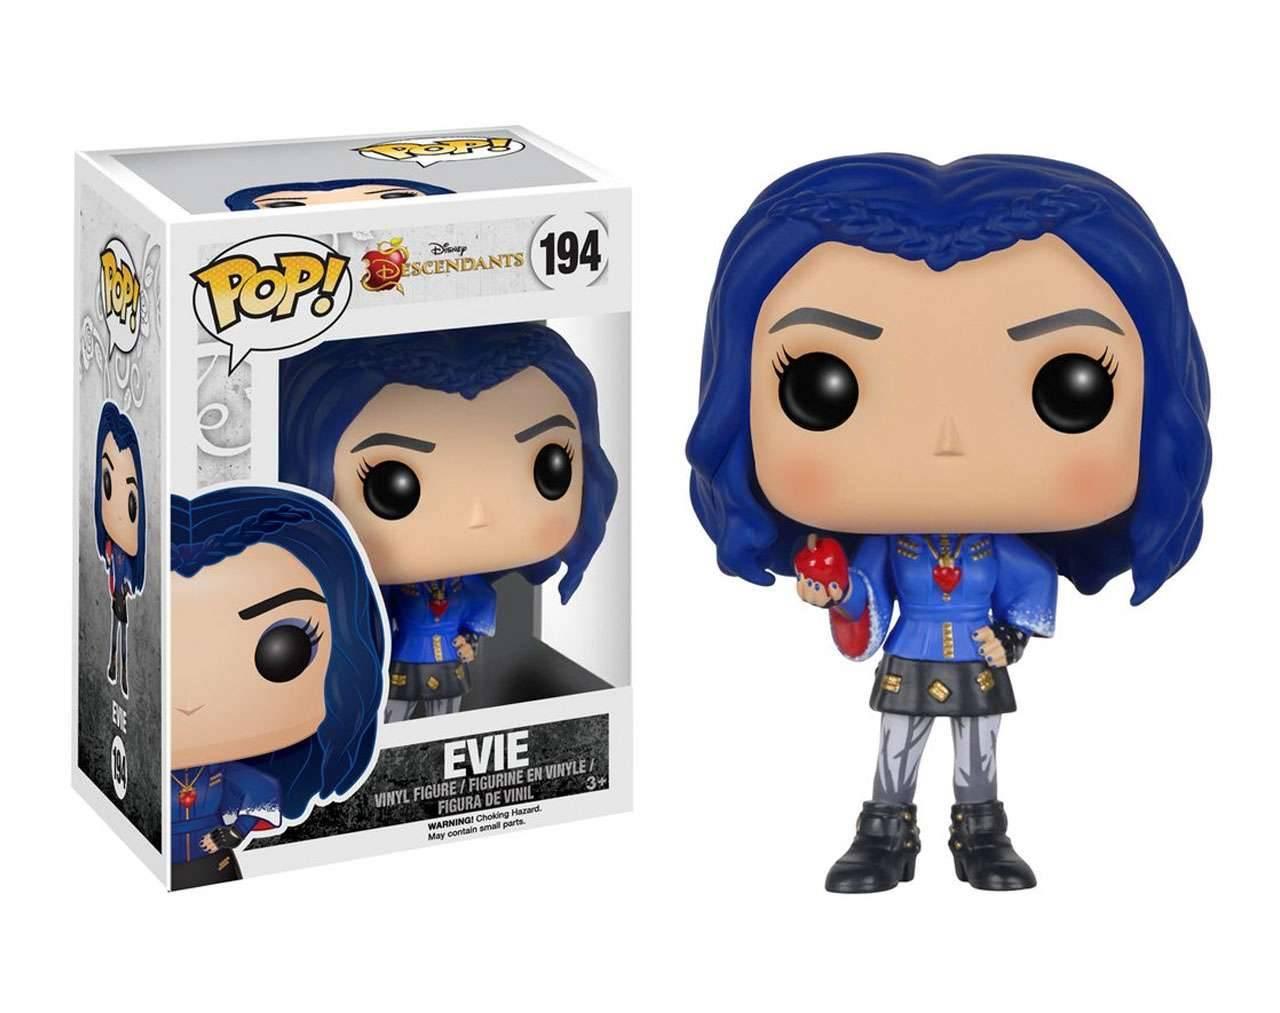 Evie Pop! Vinyl